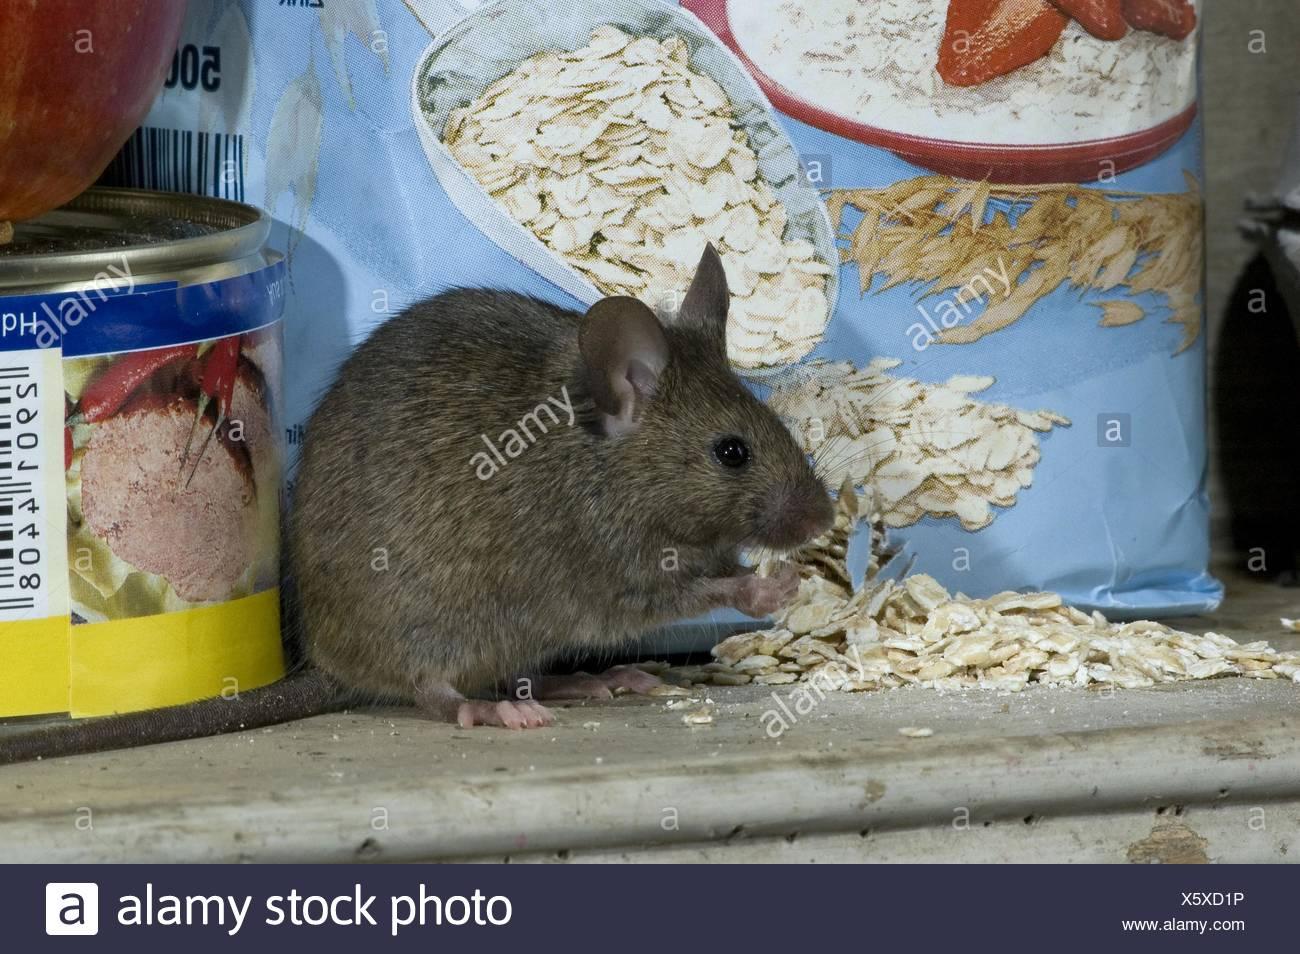 mice eats oat flakes in kitchen Stock Photo: 279020162 - Alamy